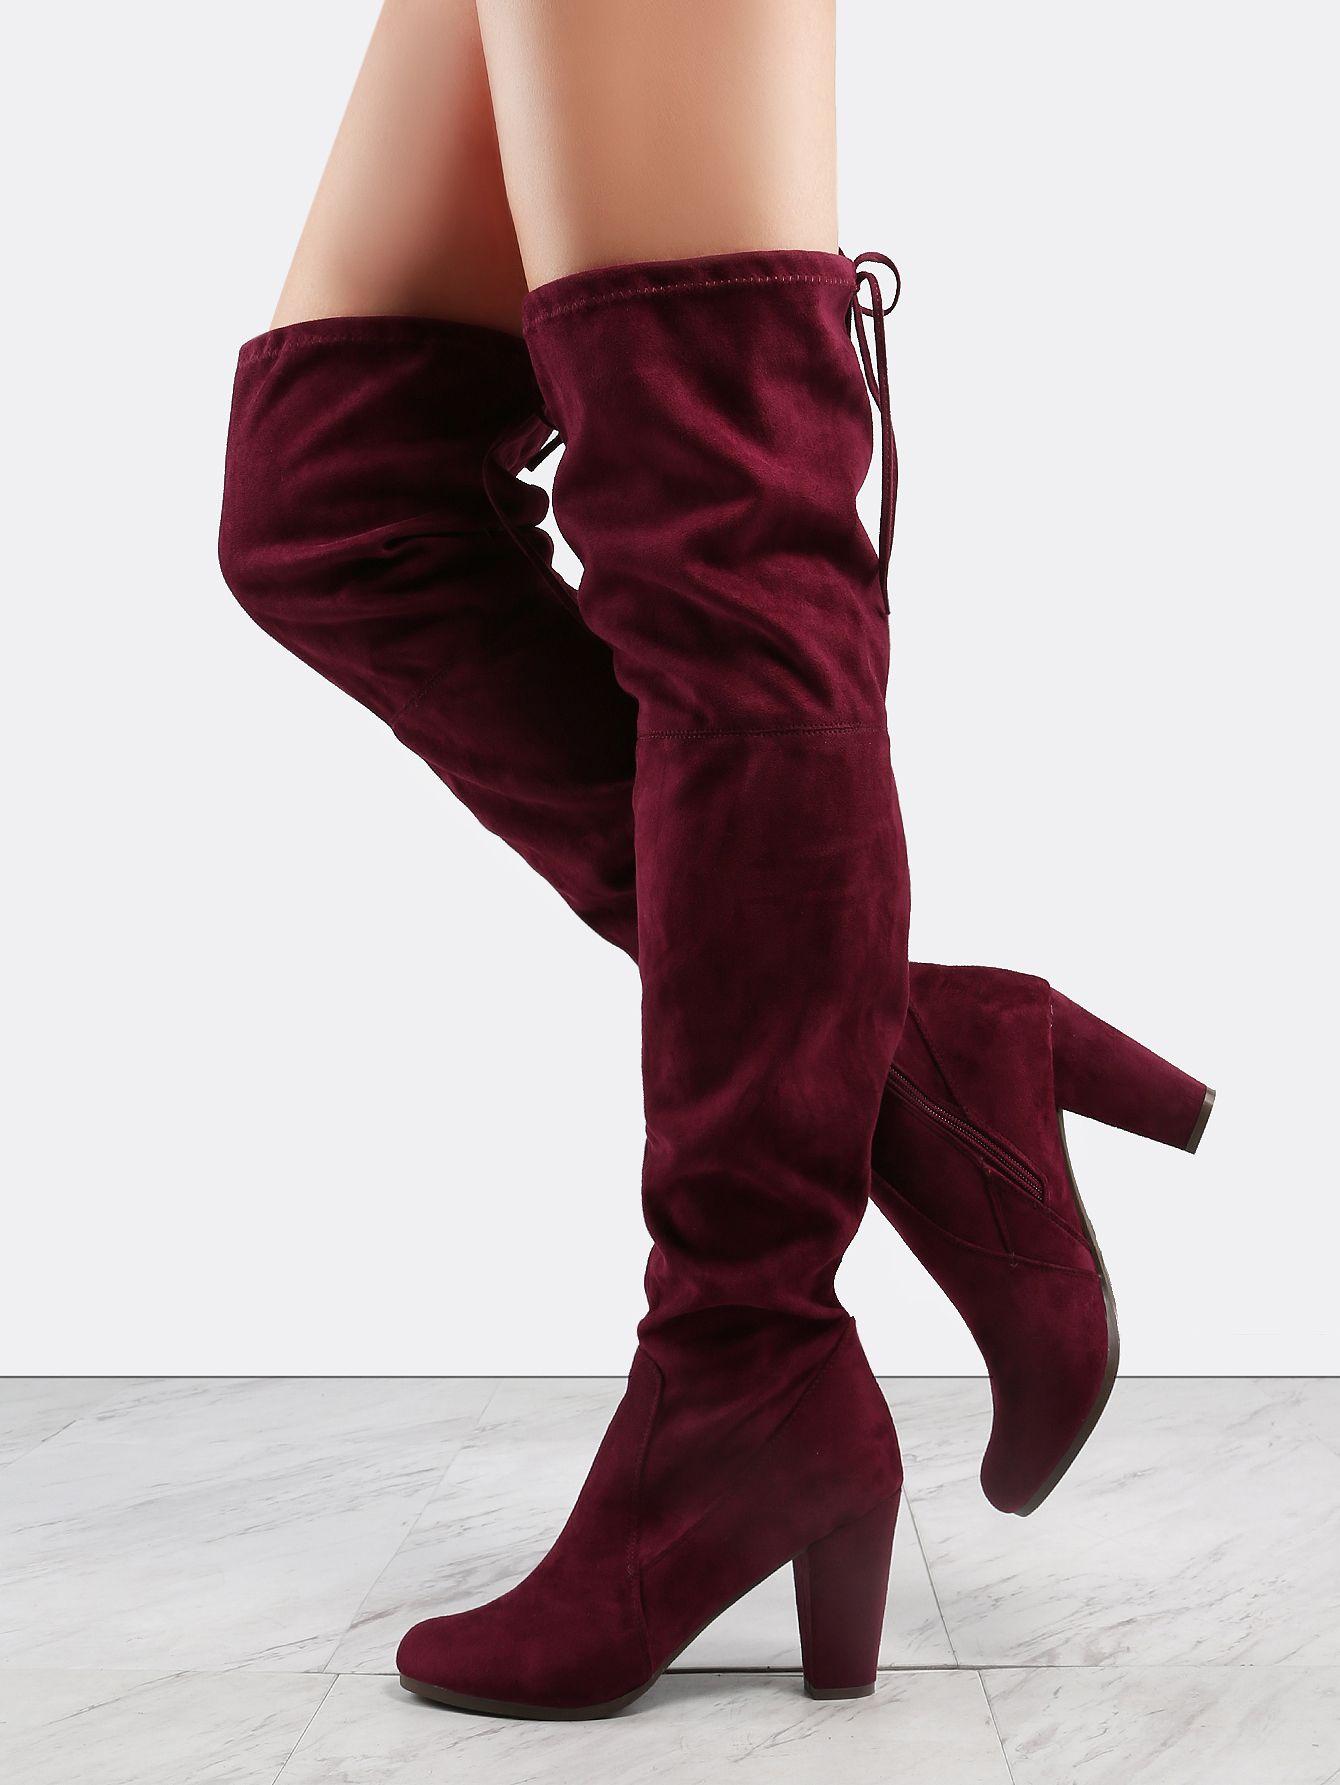 9f565b7f76 Almond Toe Thigh High Boots WINE -SheIn(Sheinside) | Crazy Cool ...